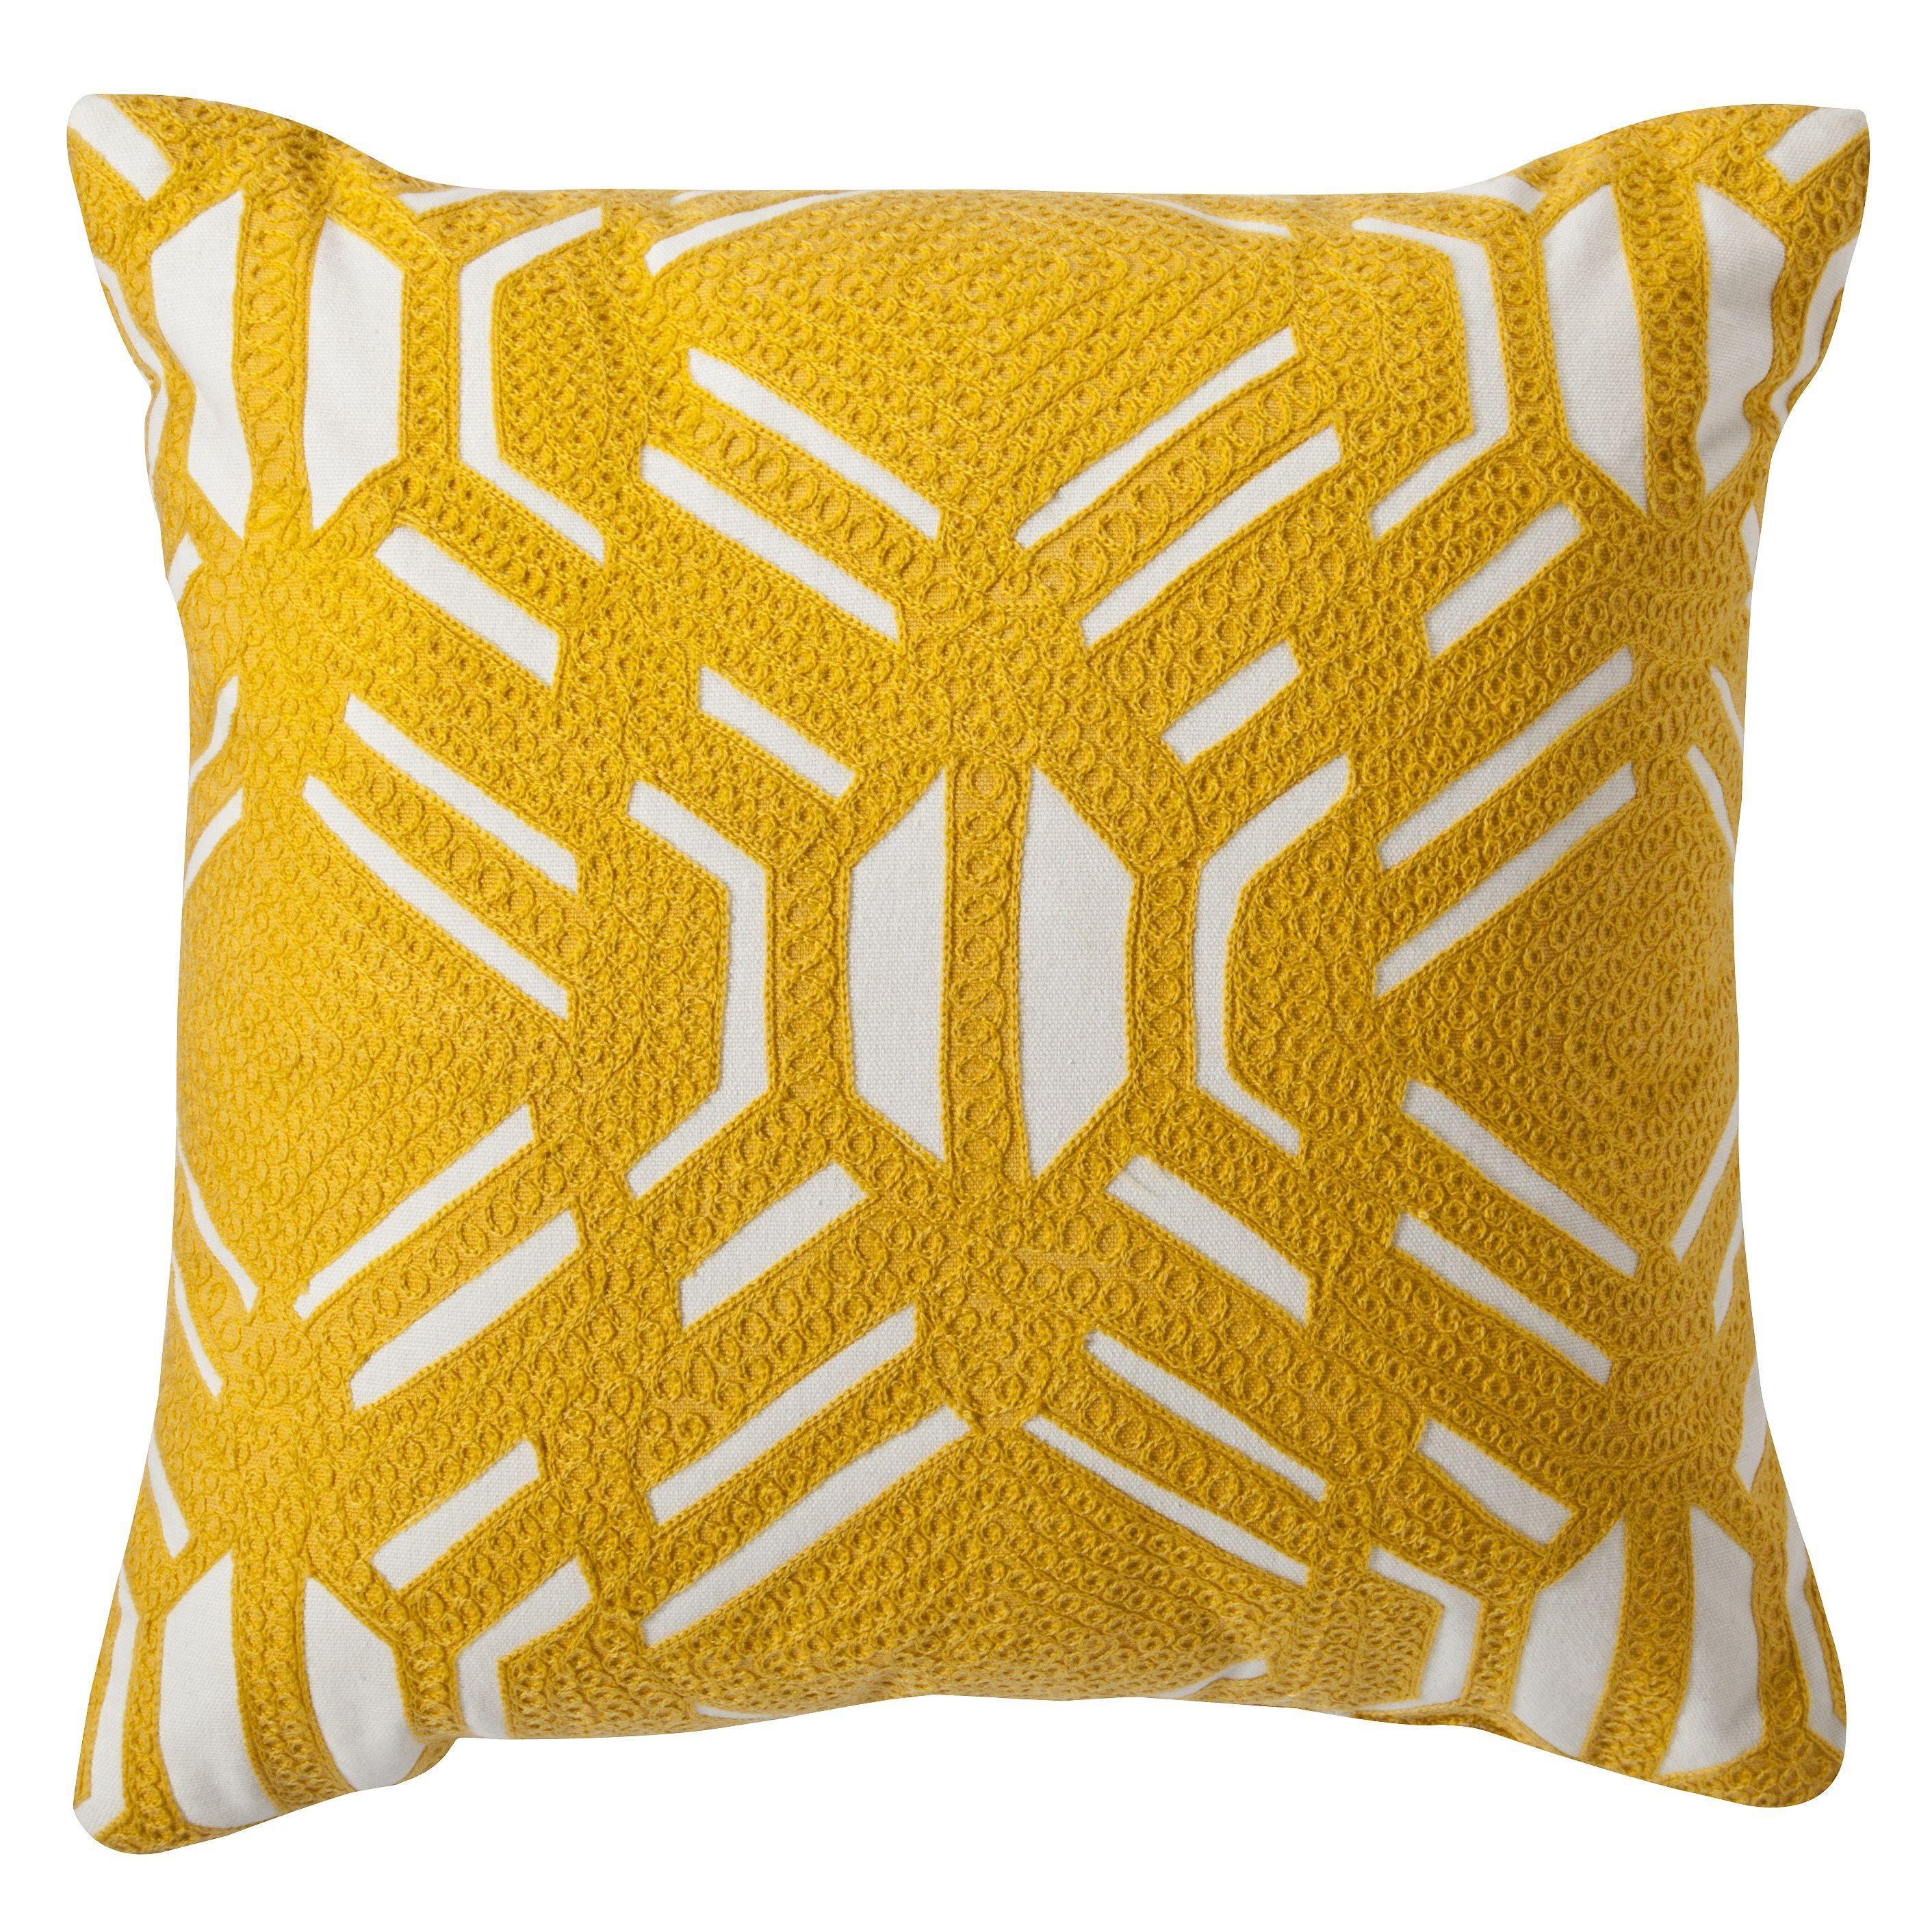 Decorative Pillows Target Yellow Decorative Pillows Room Essentials Affordable Throw Pillows